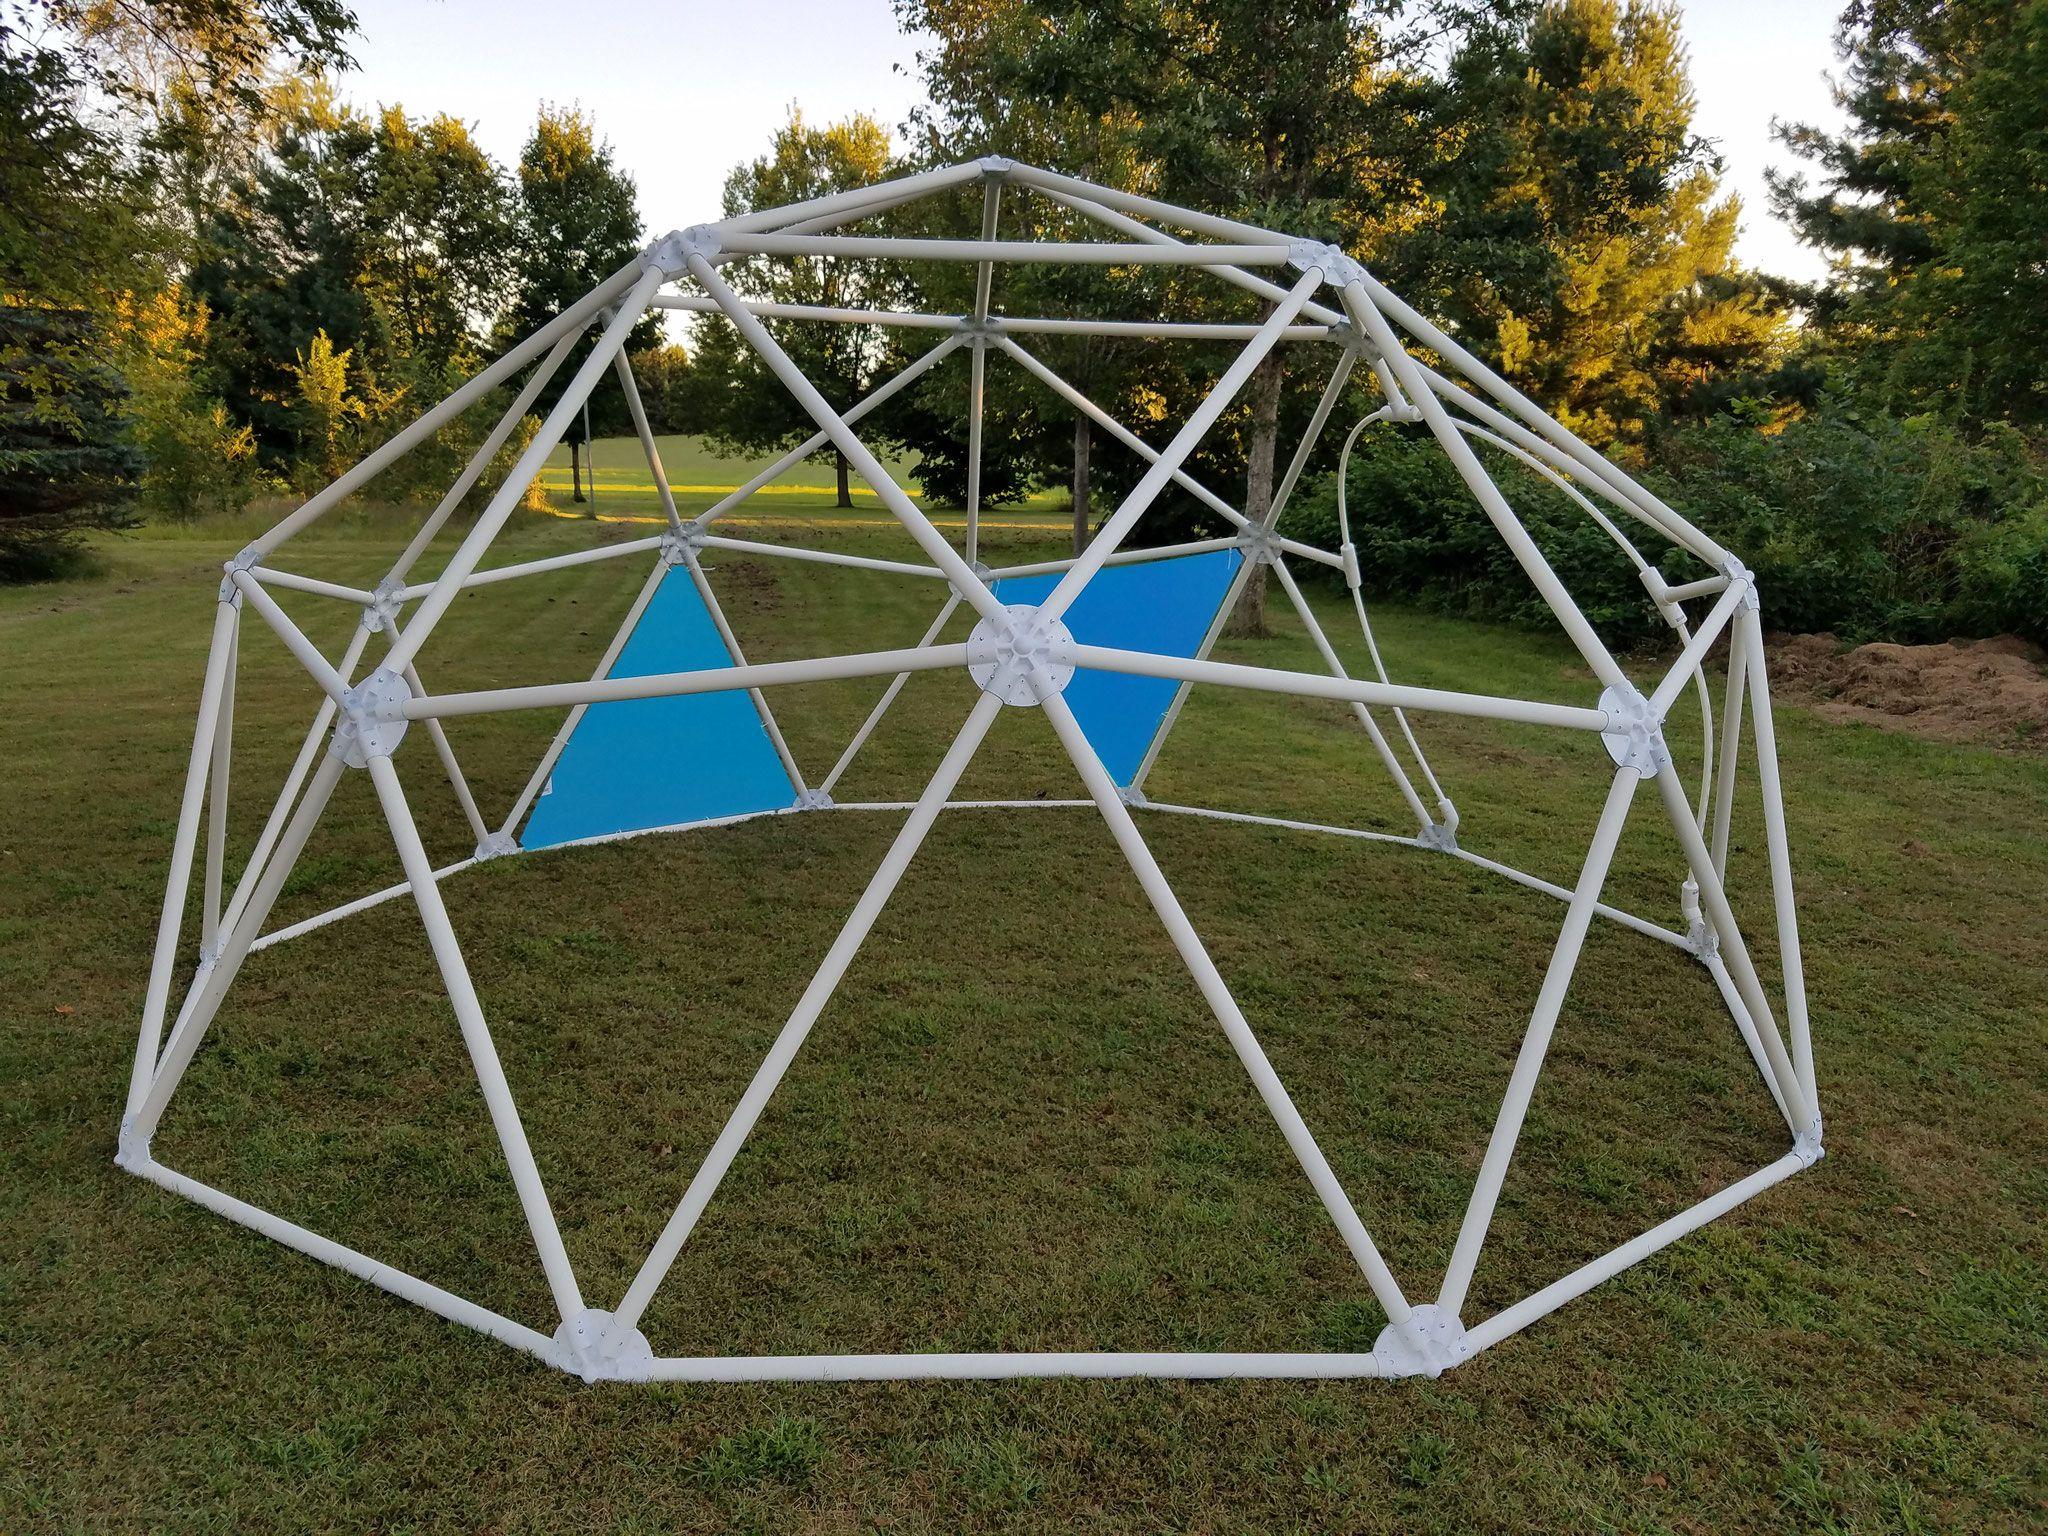 Geodesic Dome Connectors Geodesicdomekits Net In 2019